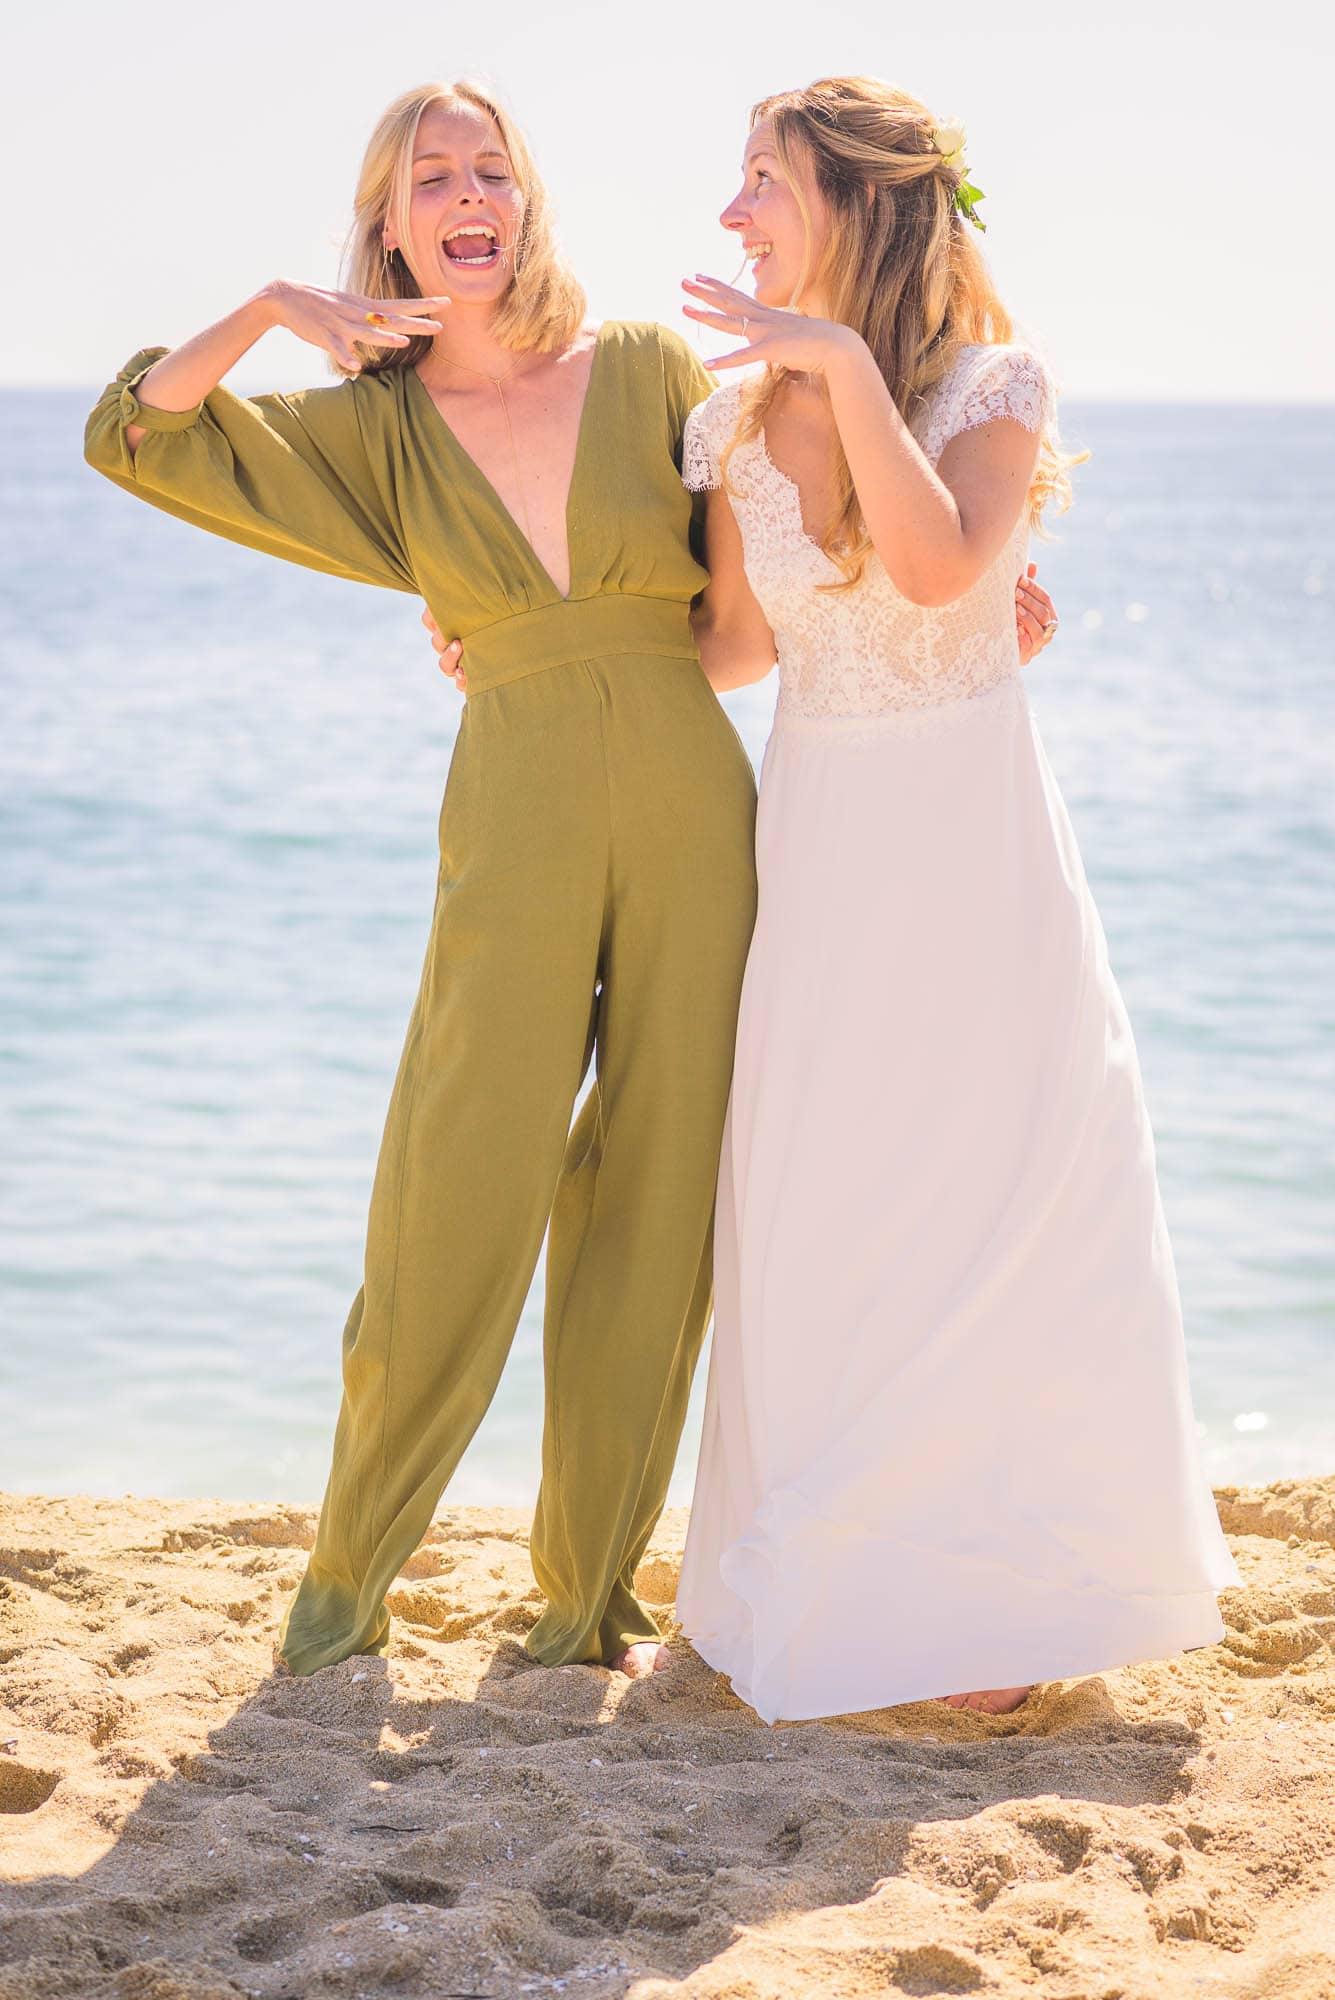 033_Alan_and_Heidi_Wedding_Verena_Andreas